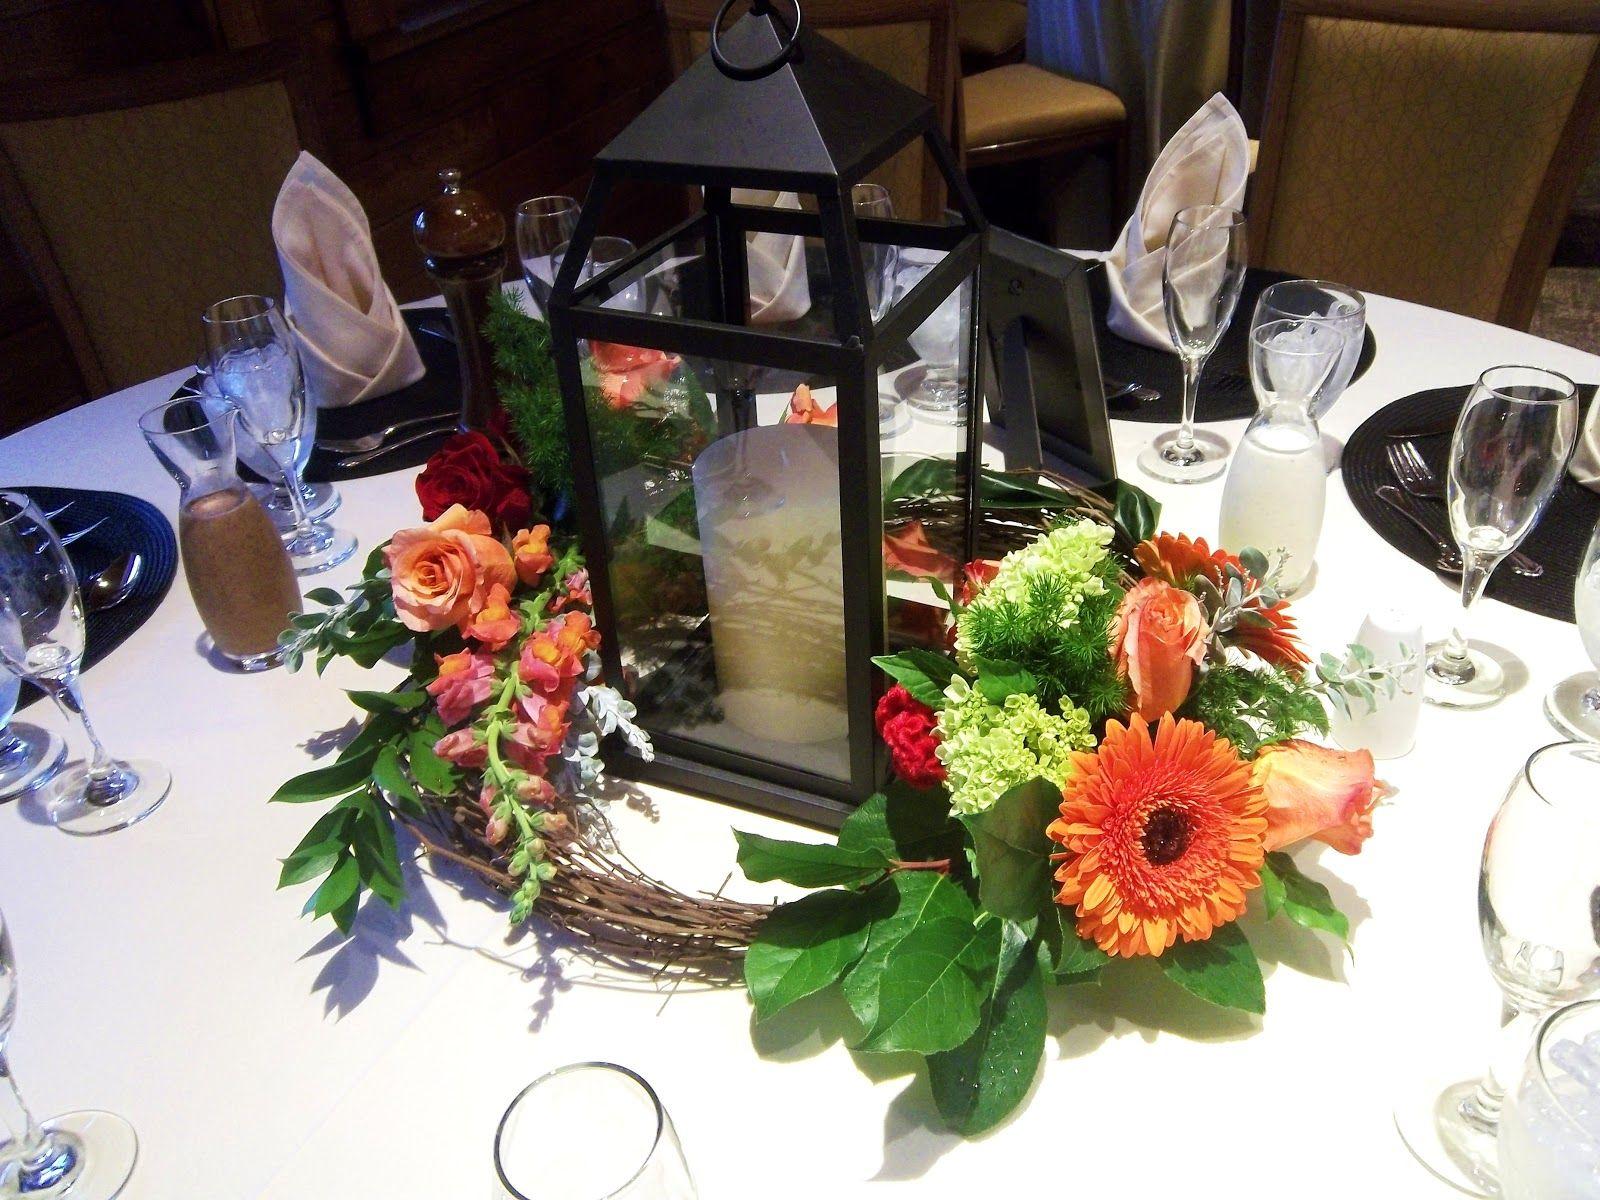 lanterns for weddings wedding lantern centerpieces fresh flowers in oasis or vials attached to vine wreath